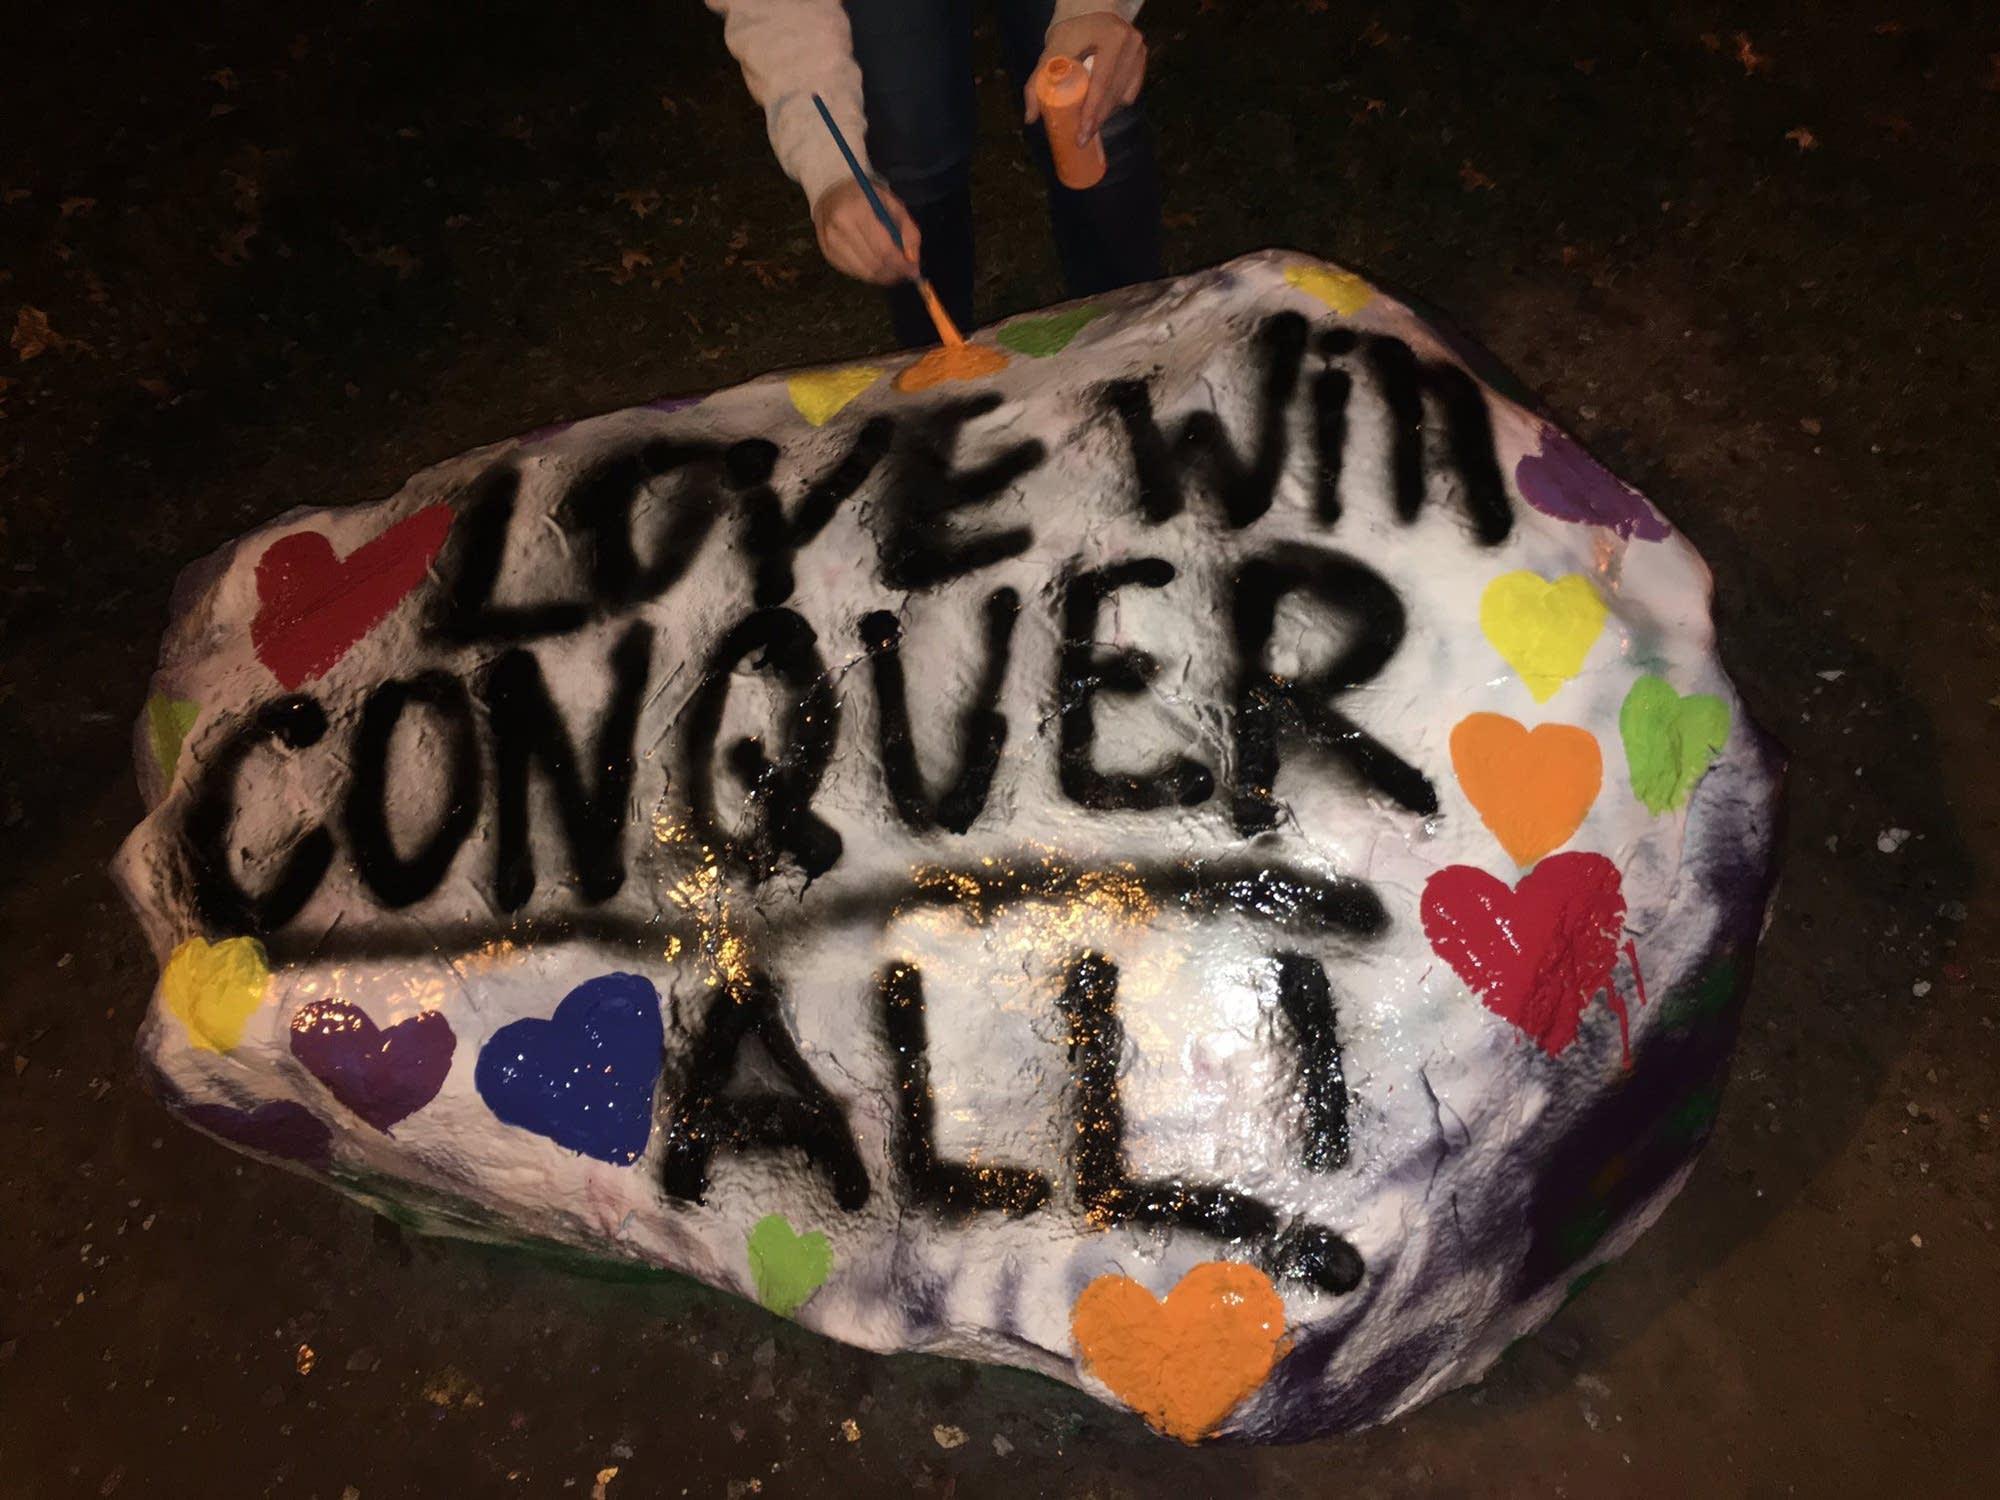 Students paint message